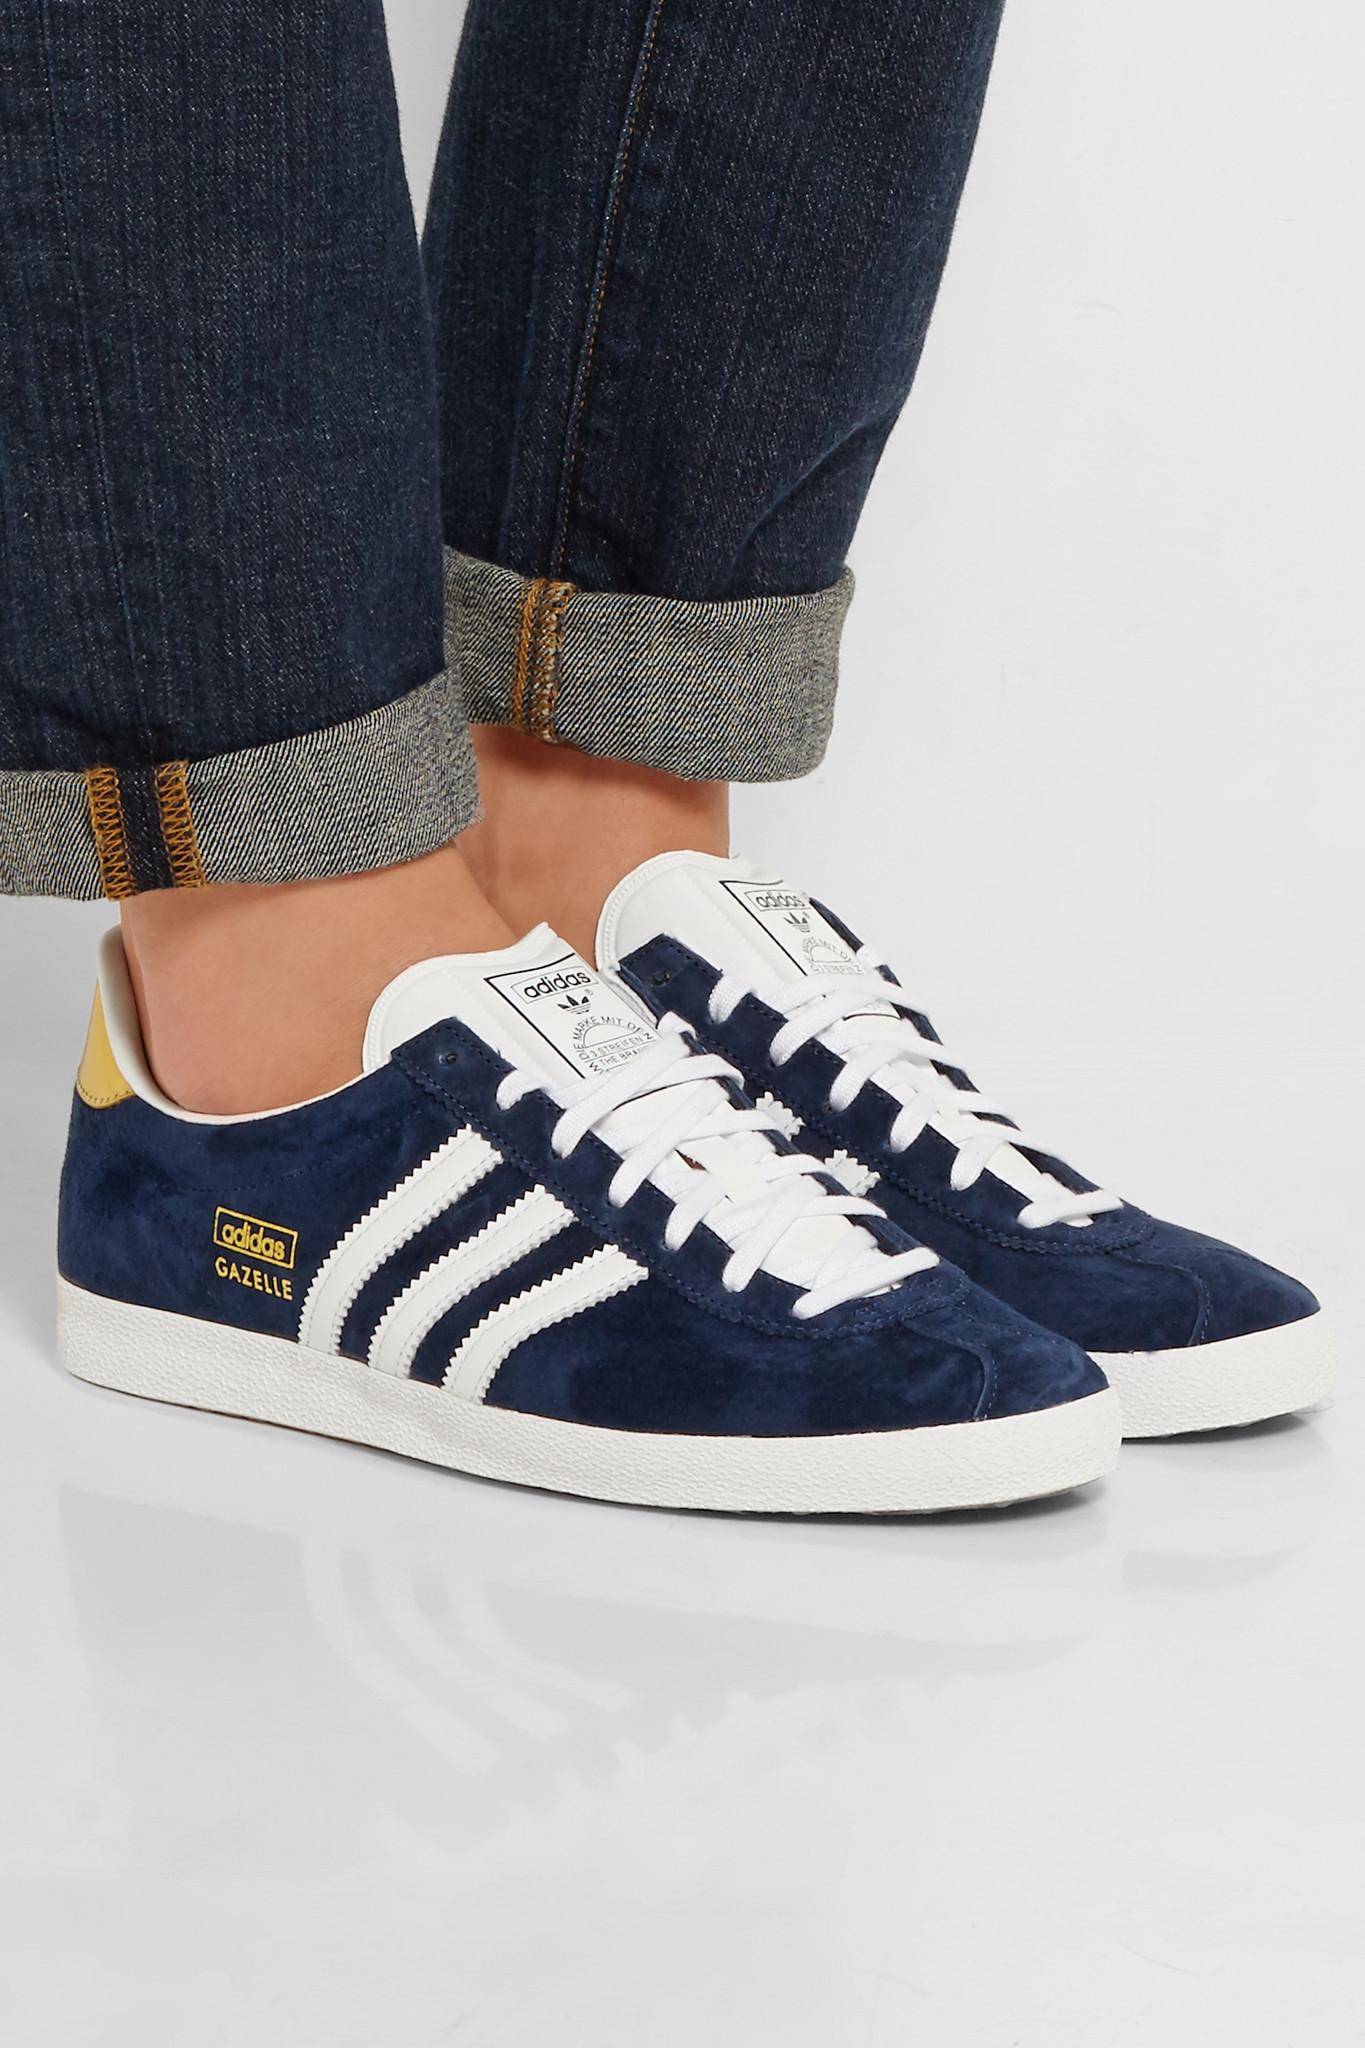 Lyst Originals In Sneakers Dg SvXqxZP 8nwx4iq764 Gazelle Adidas Suede Blue 6xqT1p4w